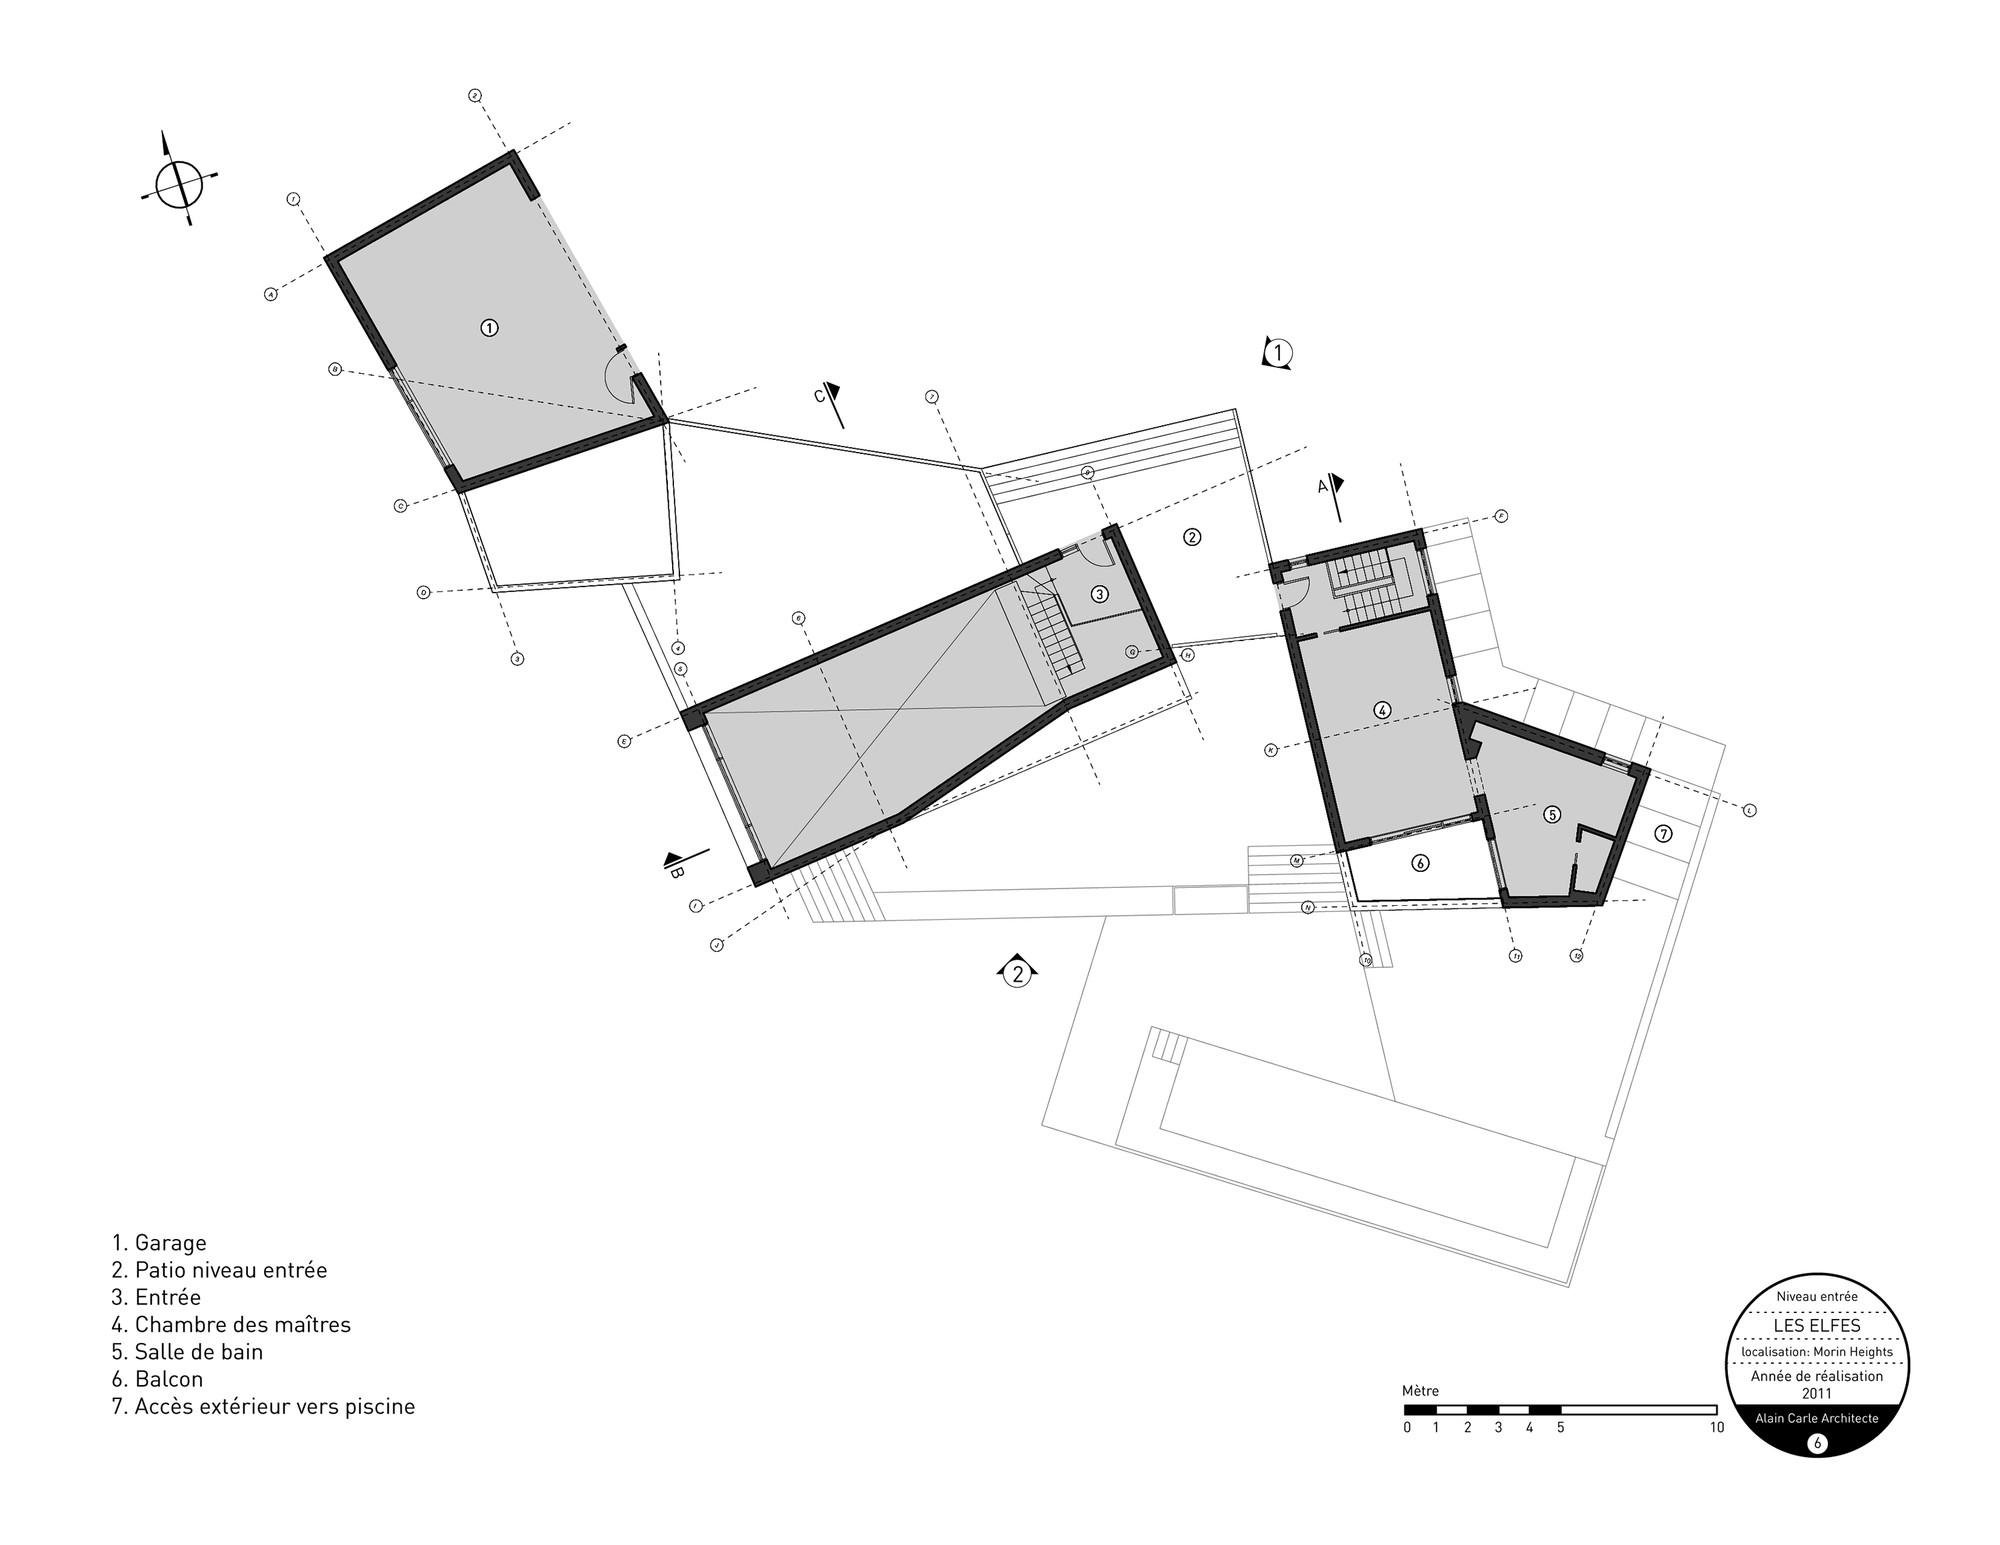 Gallery of les elfes alain carle architecte 13 for Plan architecte